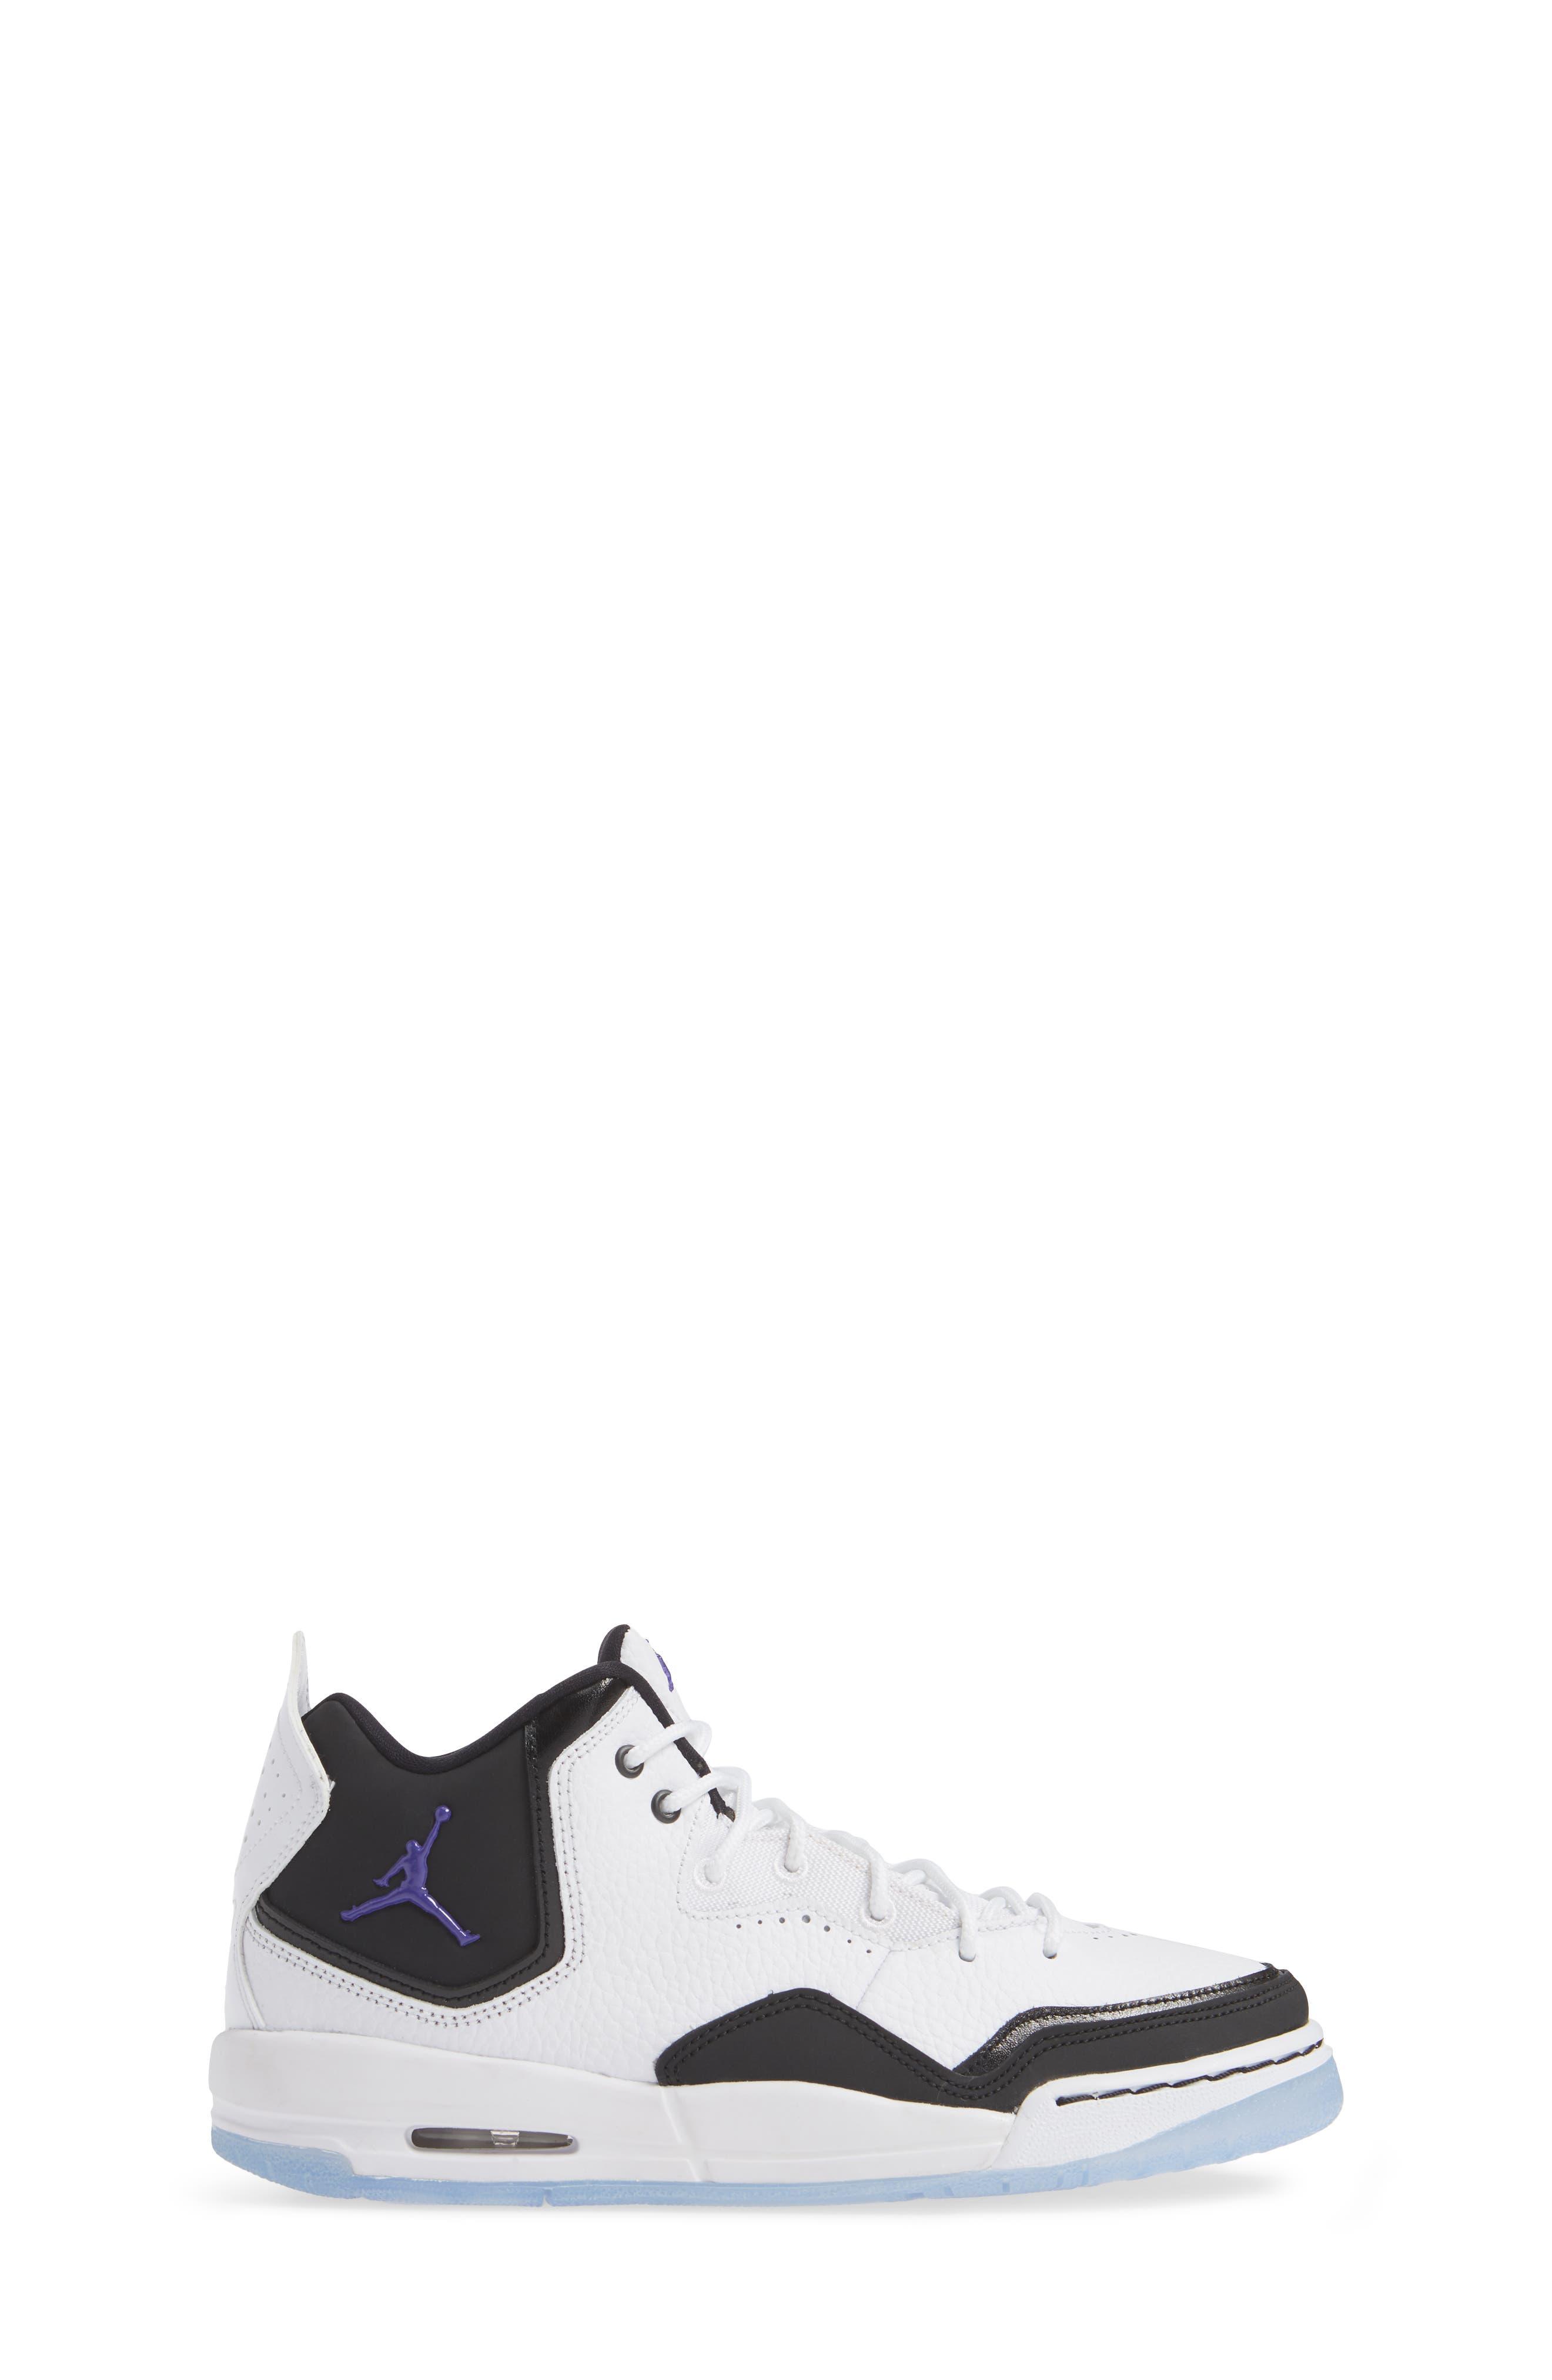 JORDAN, Nike Air Jordan Courtside 23 Sneaker, Alternate thumbnail 3, color, WHITE/ CONCORD BLACK